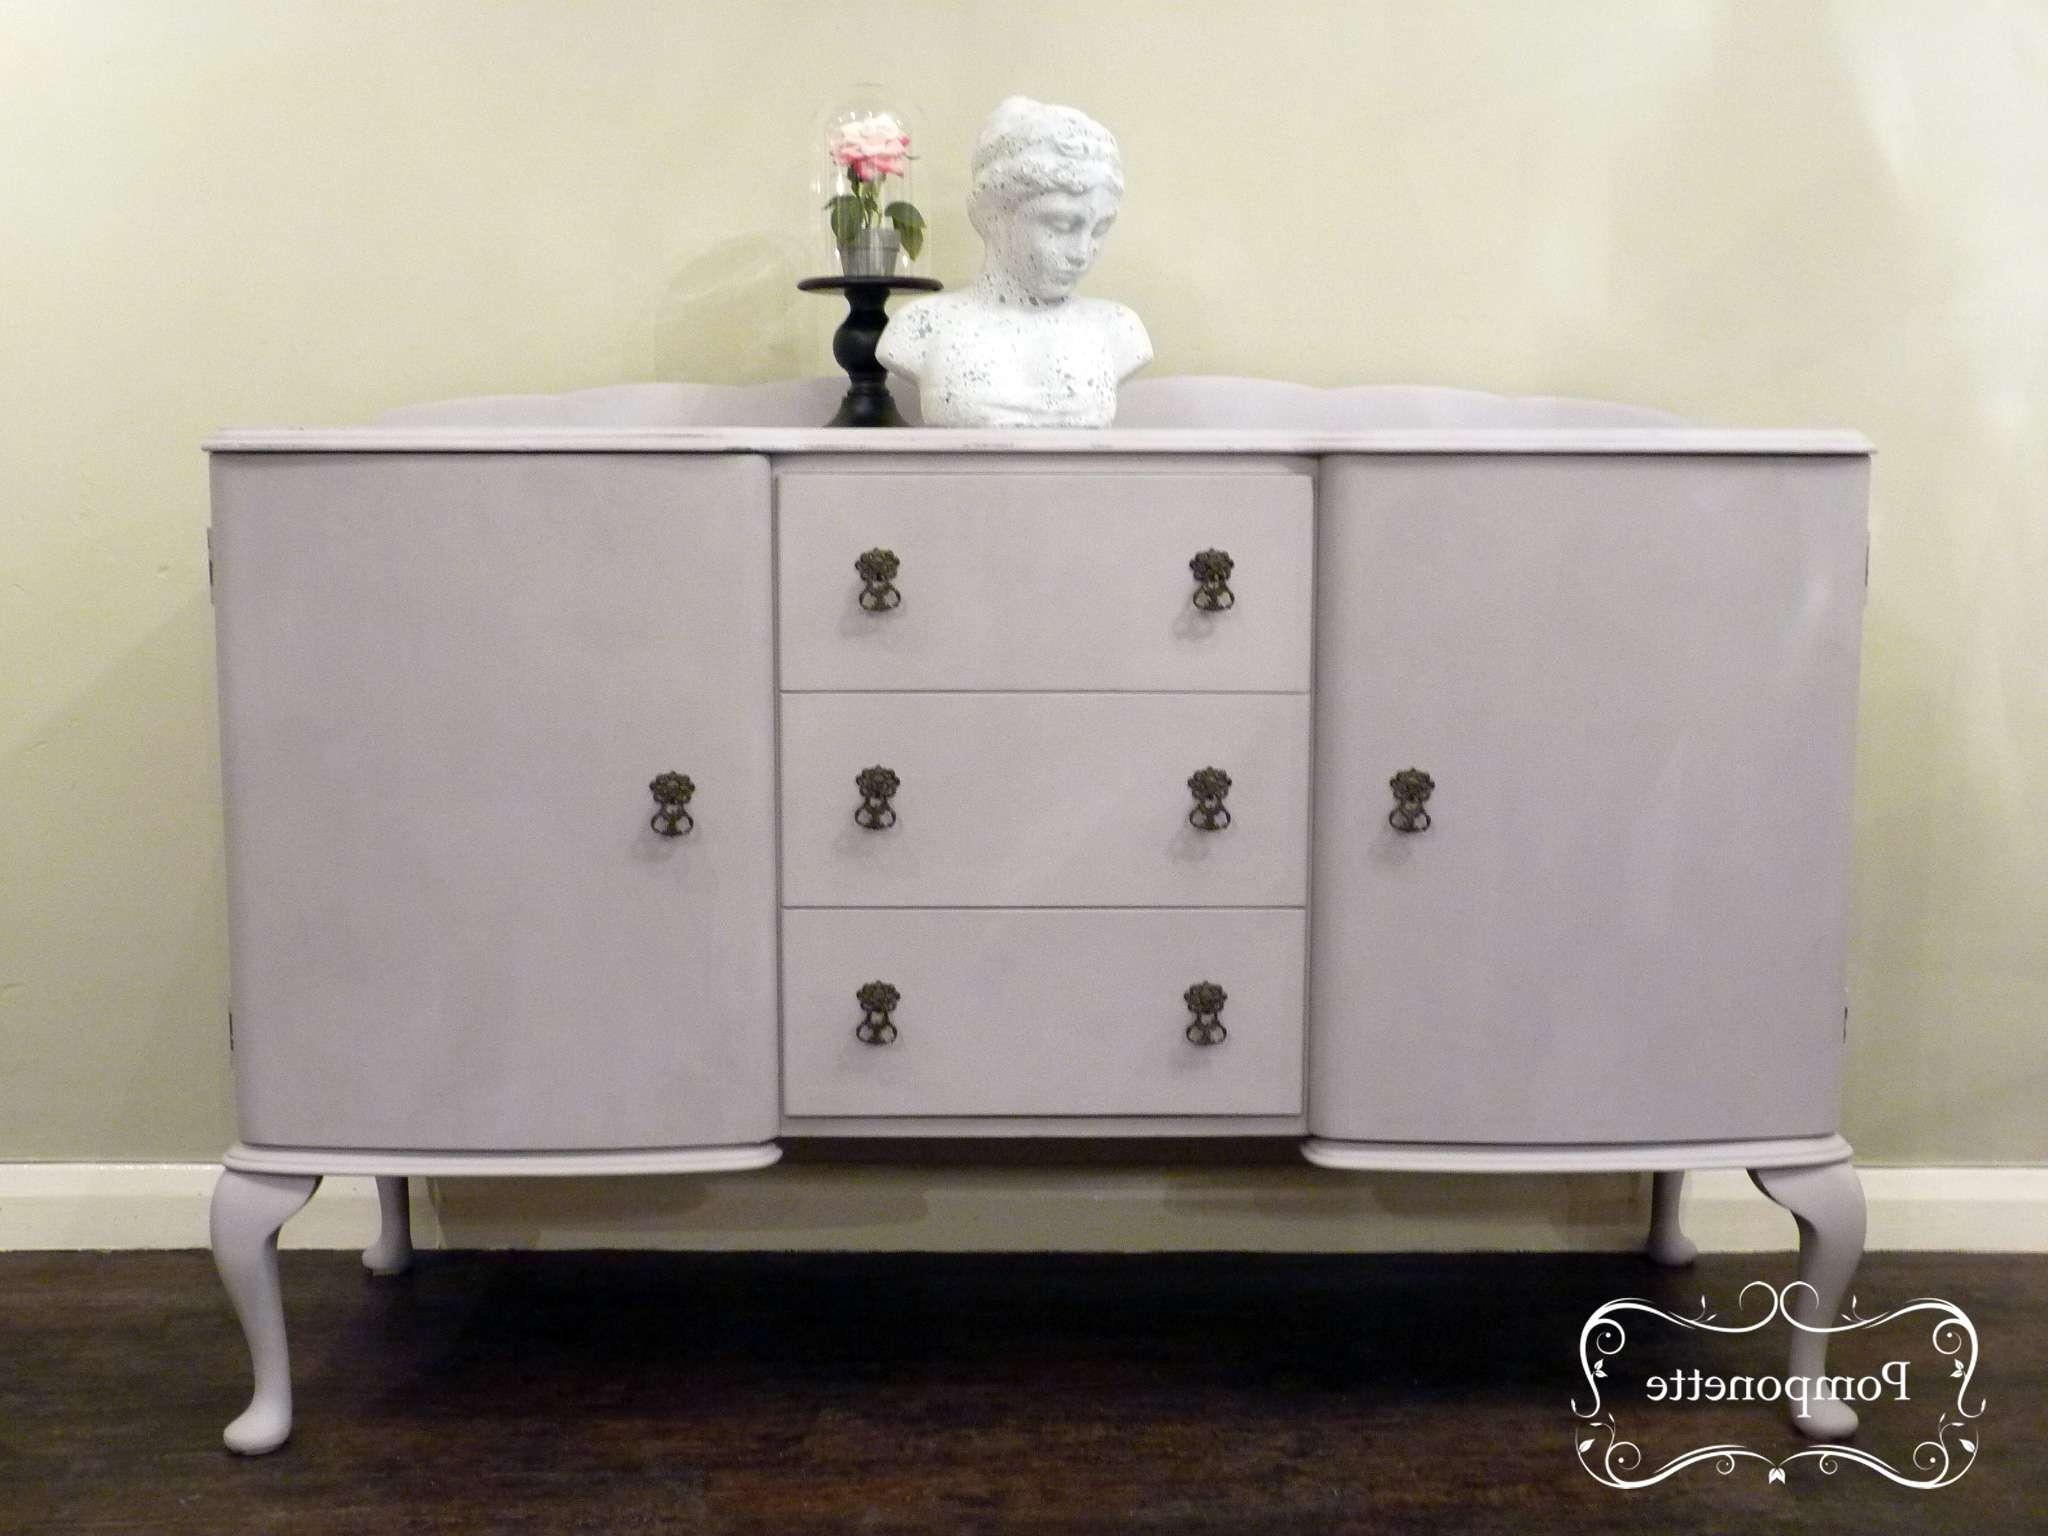 Sideboardpomponette|vintage Painted Furniture In Annie Sloan Painted Sideboards (View 8 of 20)